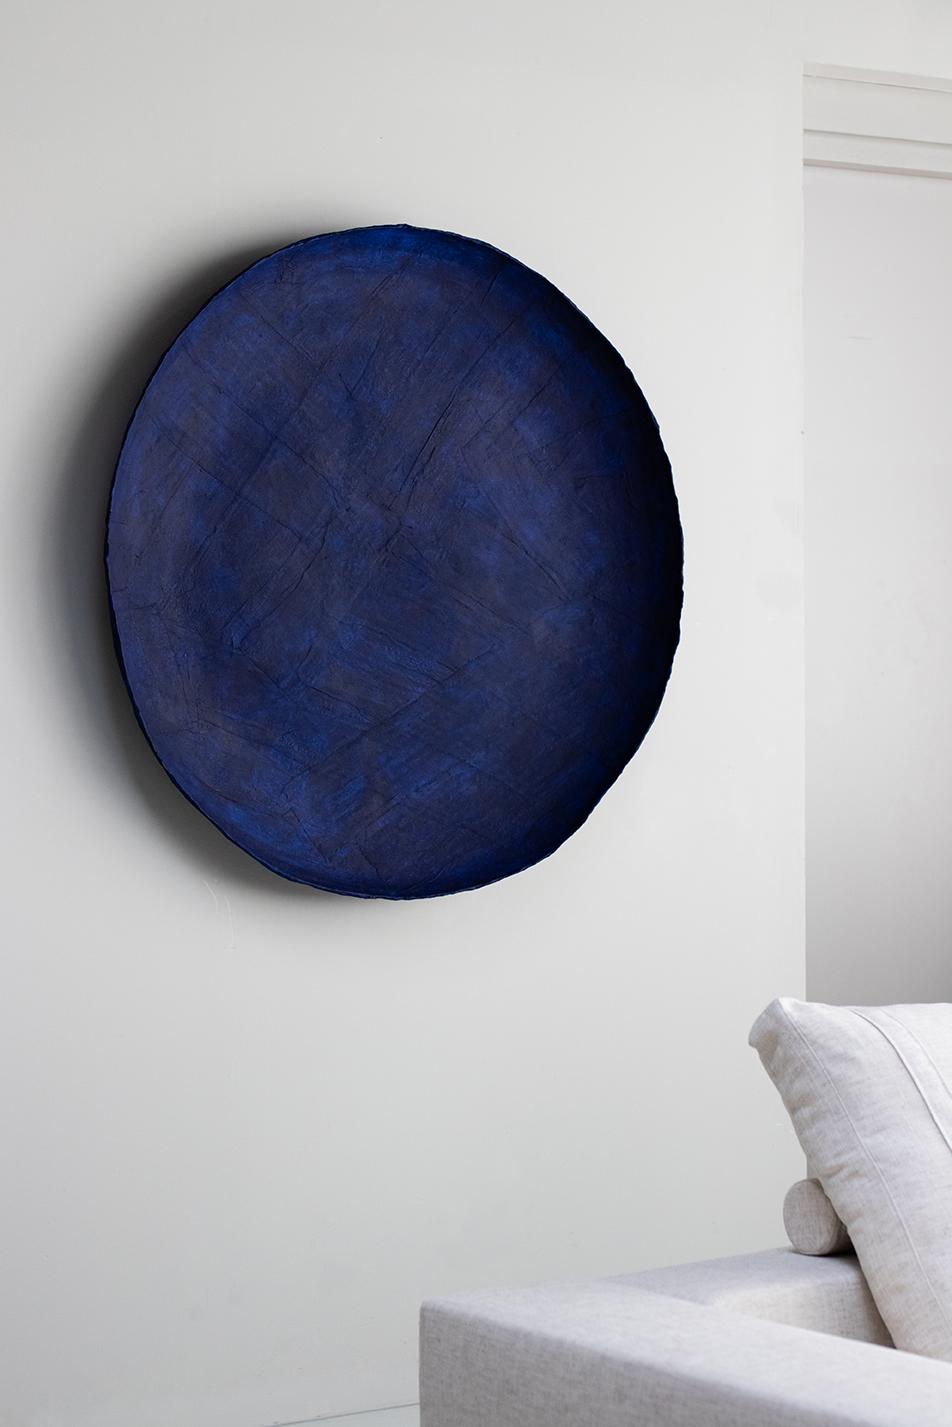 Art Bowl - night Blue by July Adrichem